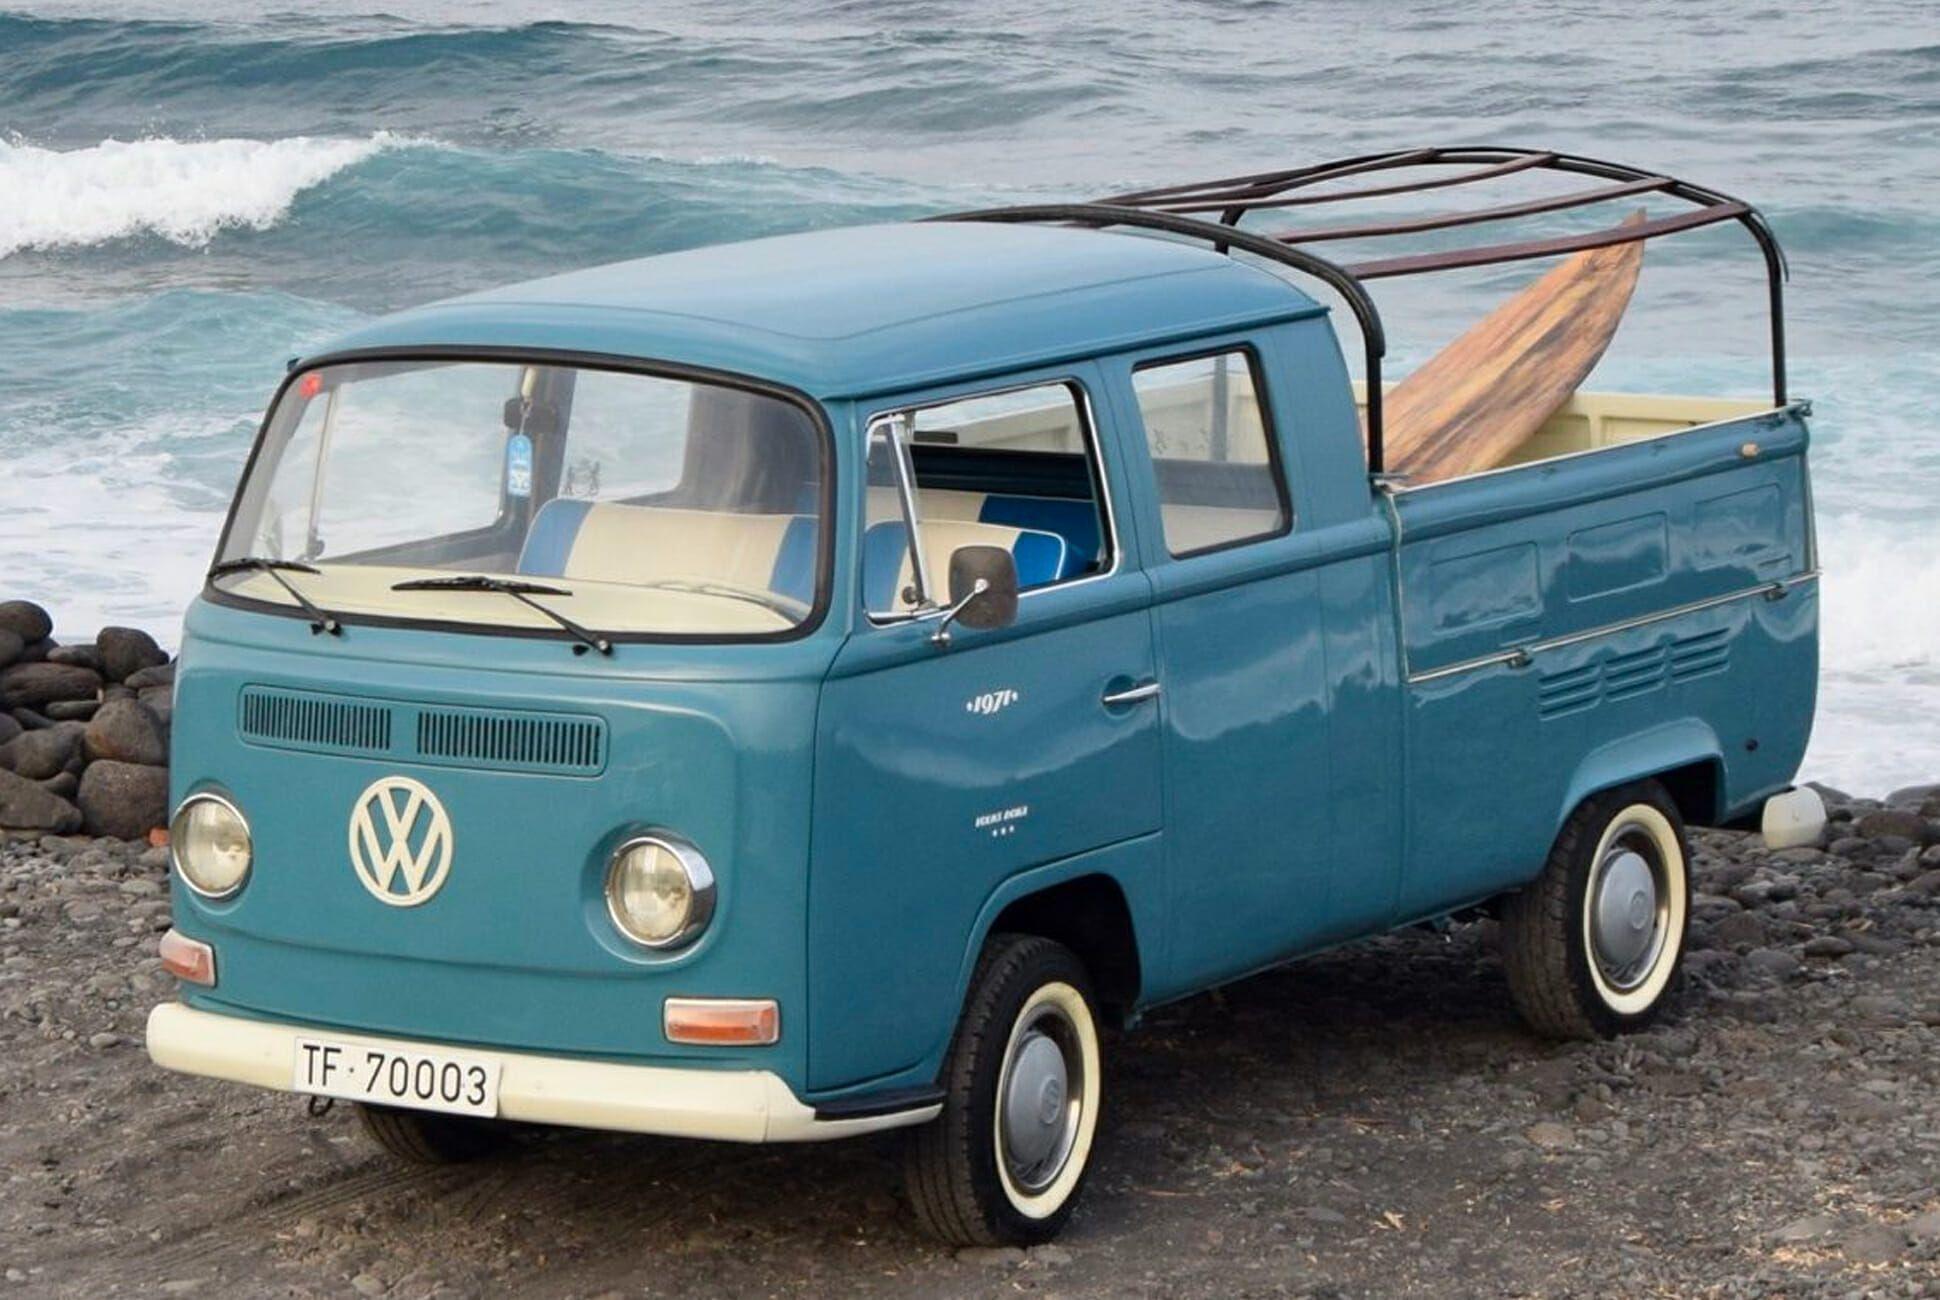 1971-Volkswagen-T2-Doka-Transporter-gear-patrol-slide-01